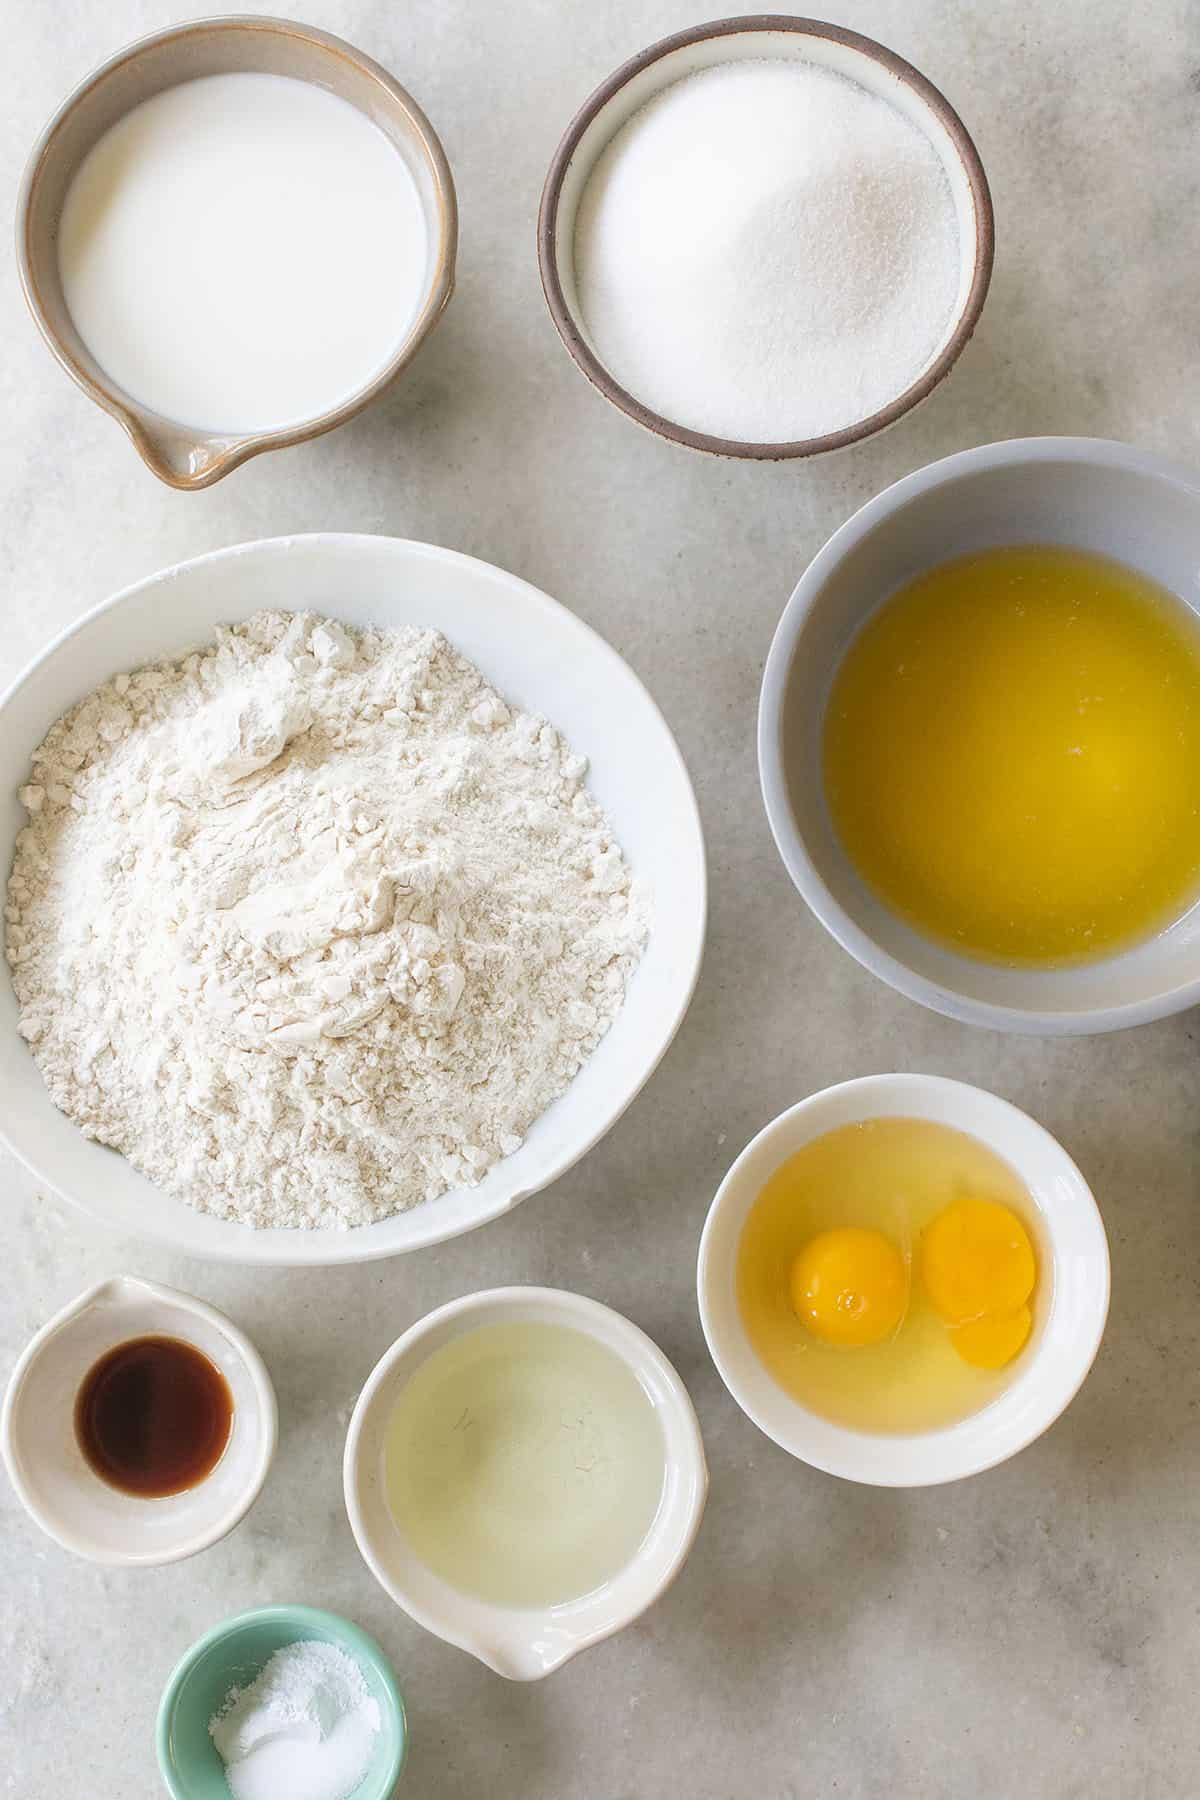 crumb cake ingredients